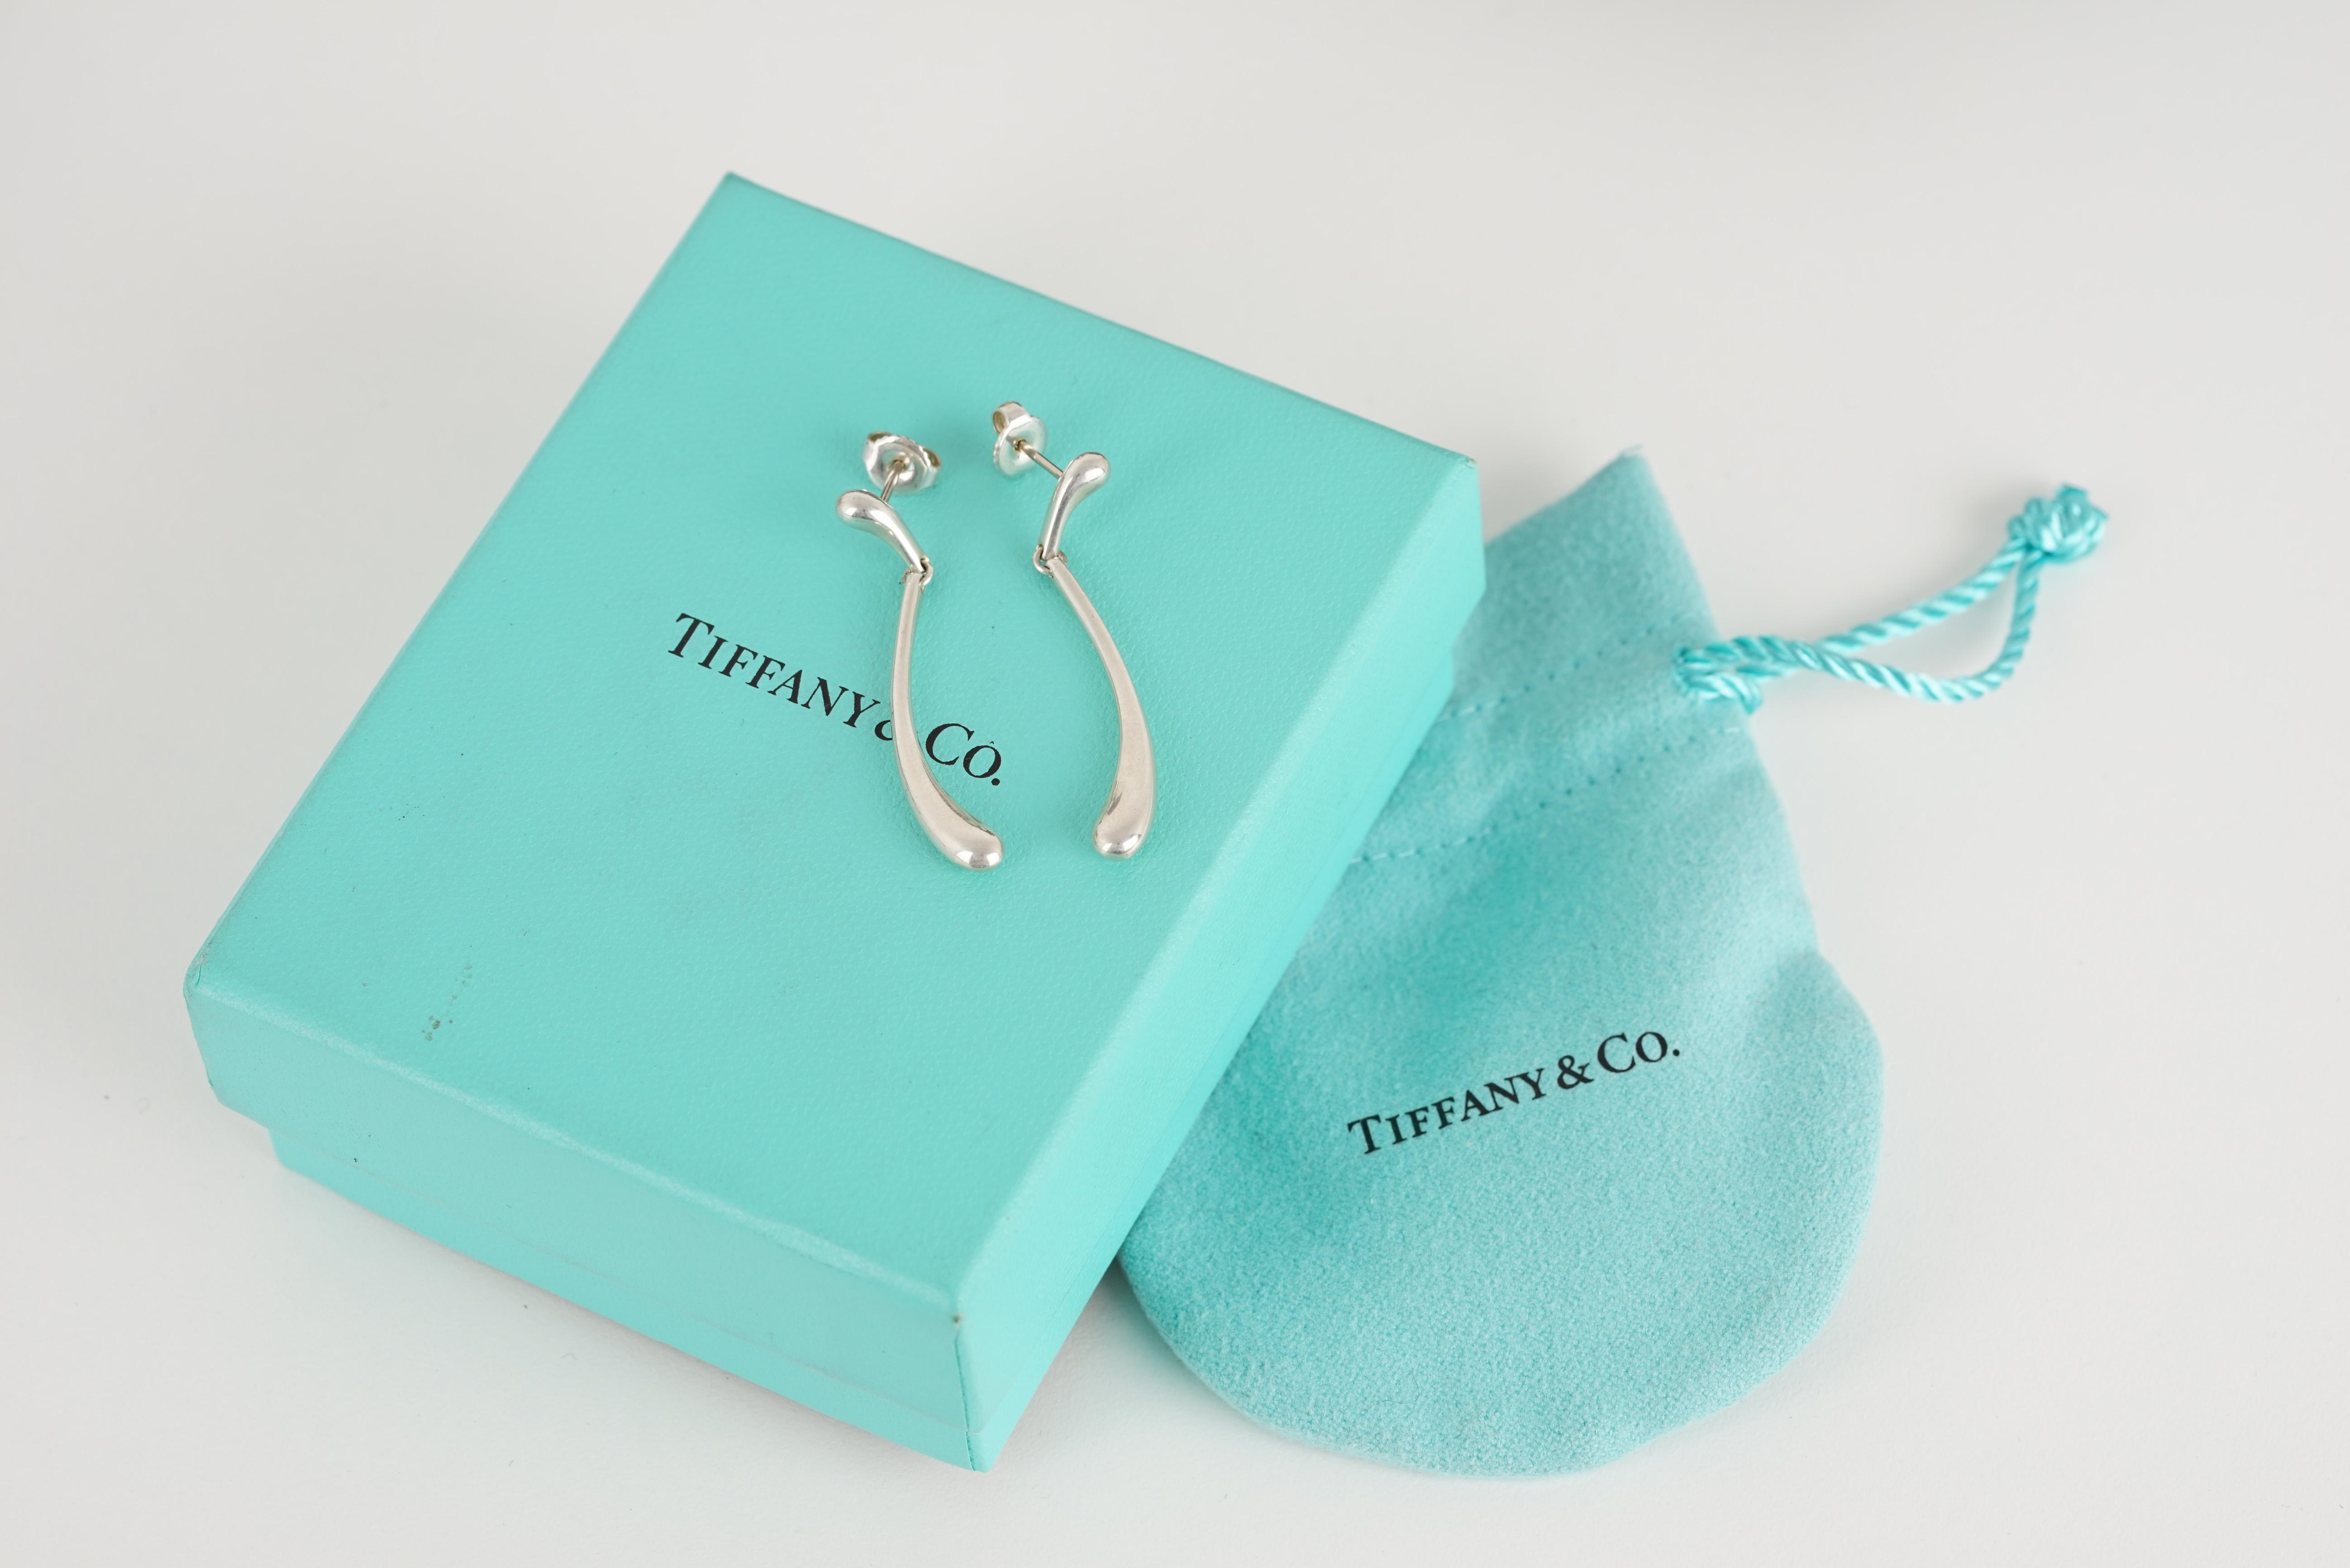 PAIR OF TIFFANY & CO ELSA PERETTI DROP EARRINGS W/ BOX & POUCH, tiffany and co earrings designed